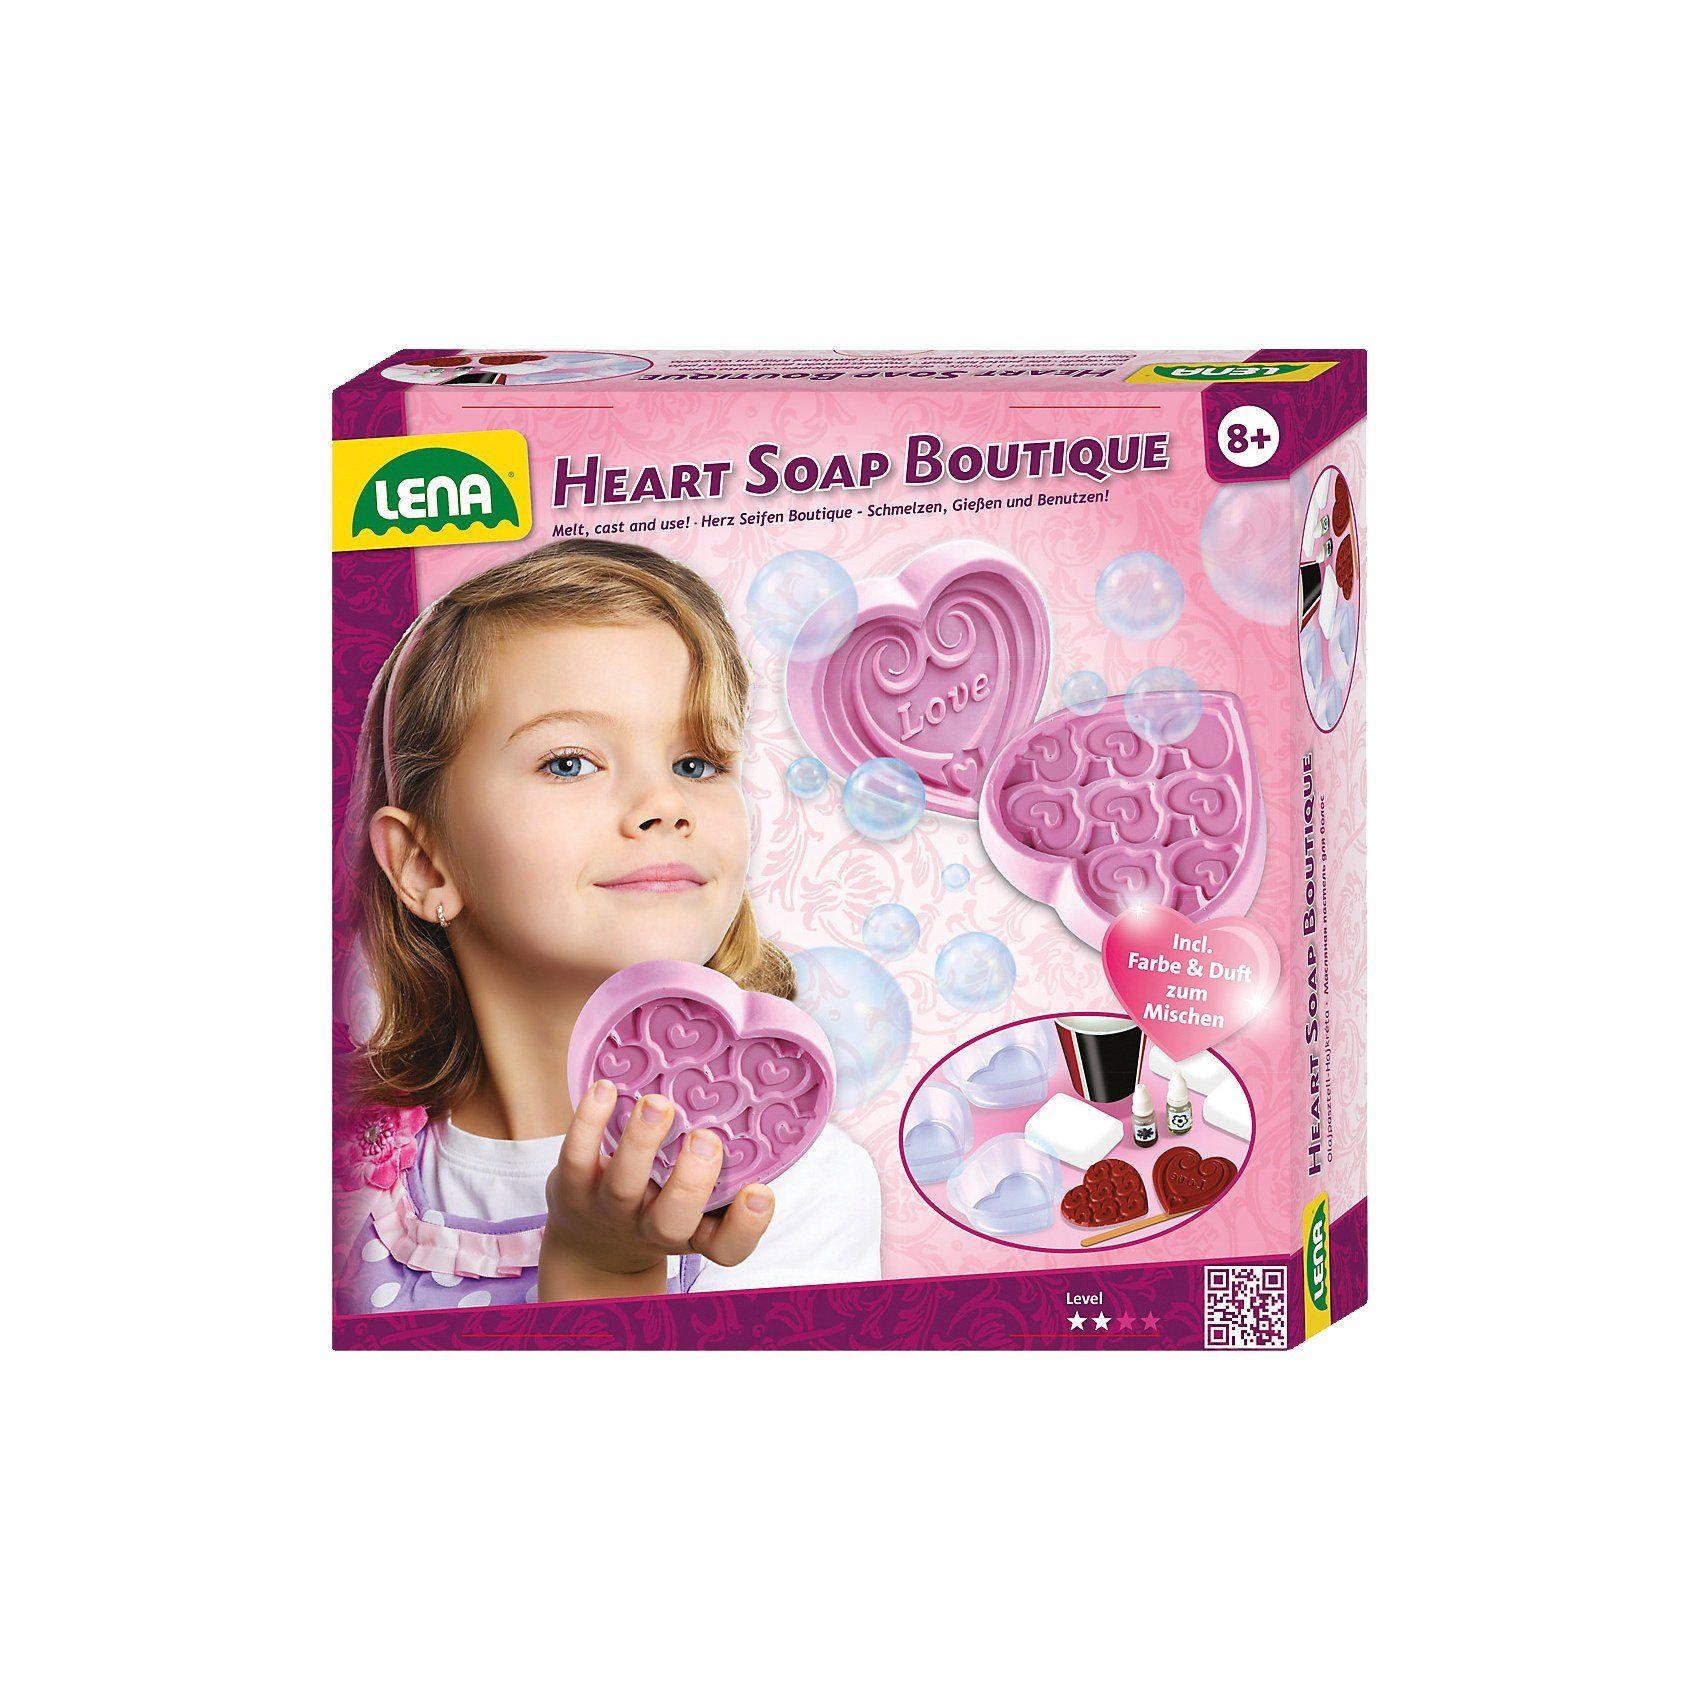 Lena® Heart Soap Boutique Kreativset Seifengießen